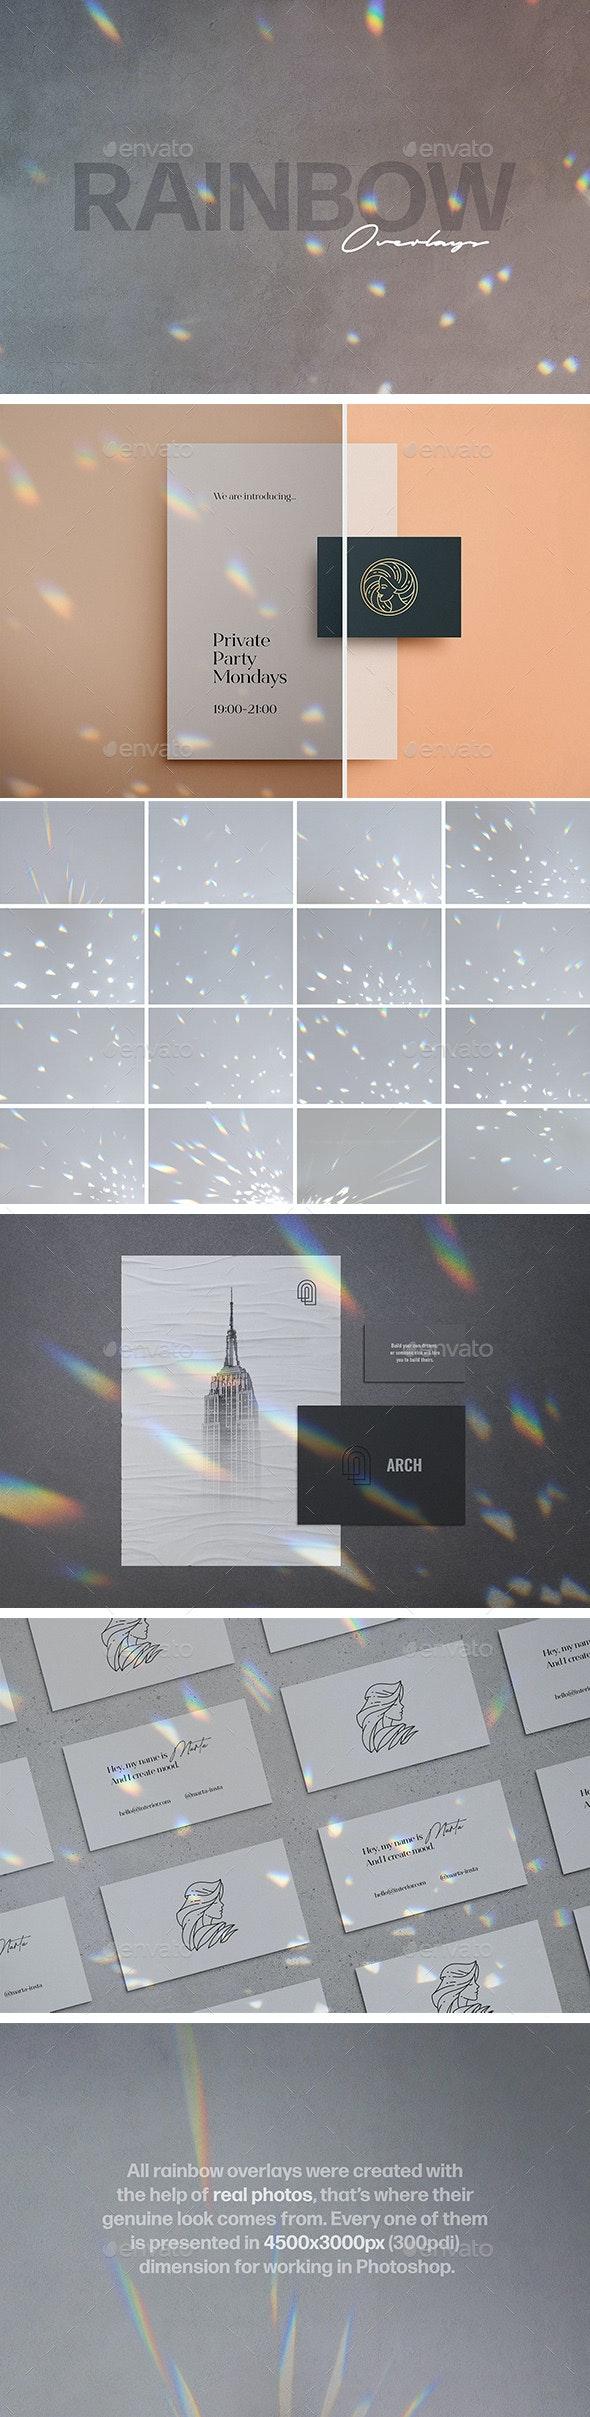 Spectrum Rainbow Photo Overlays - Miscellaneous Photo Templates